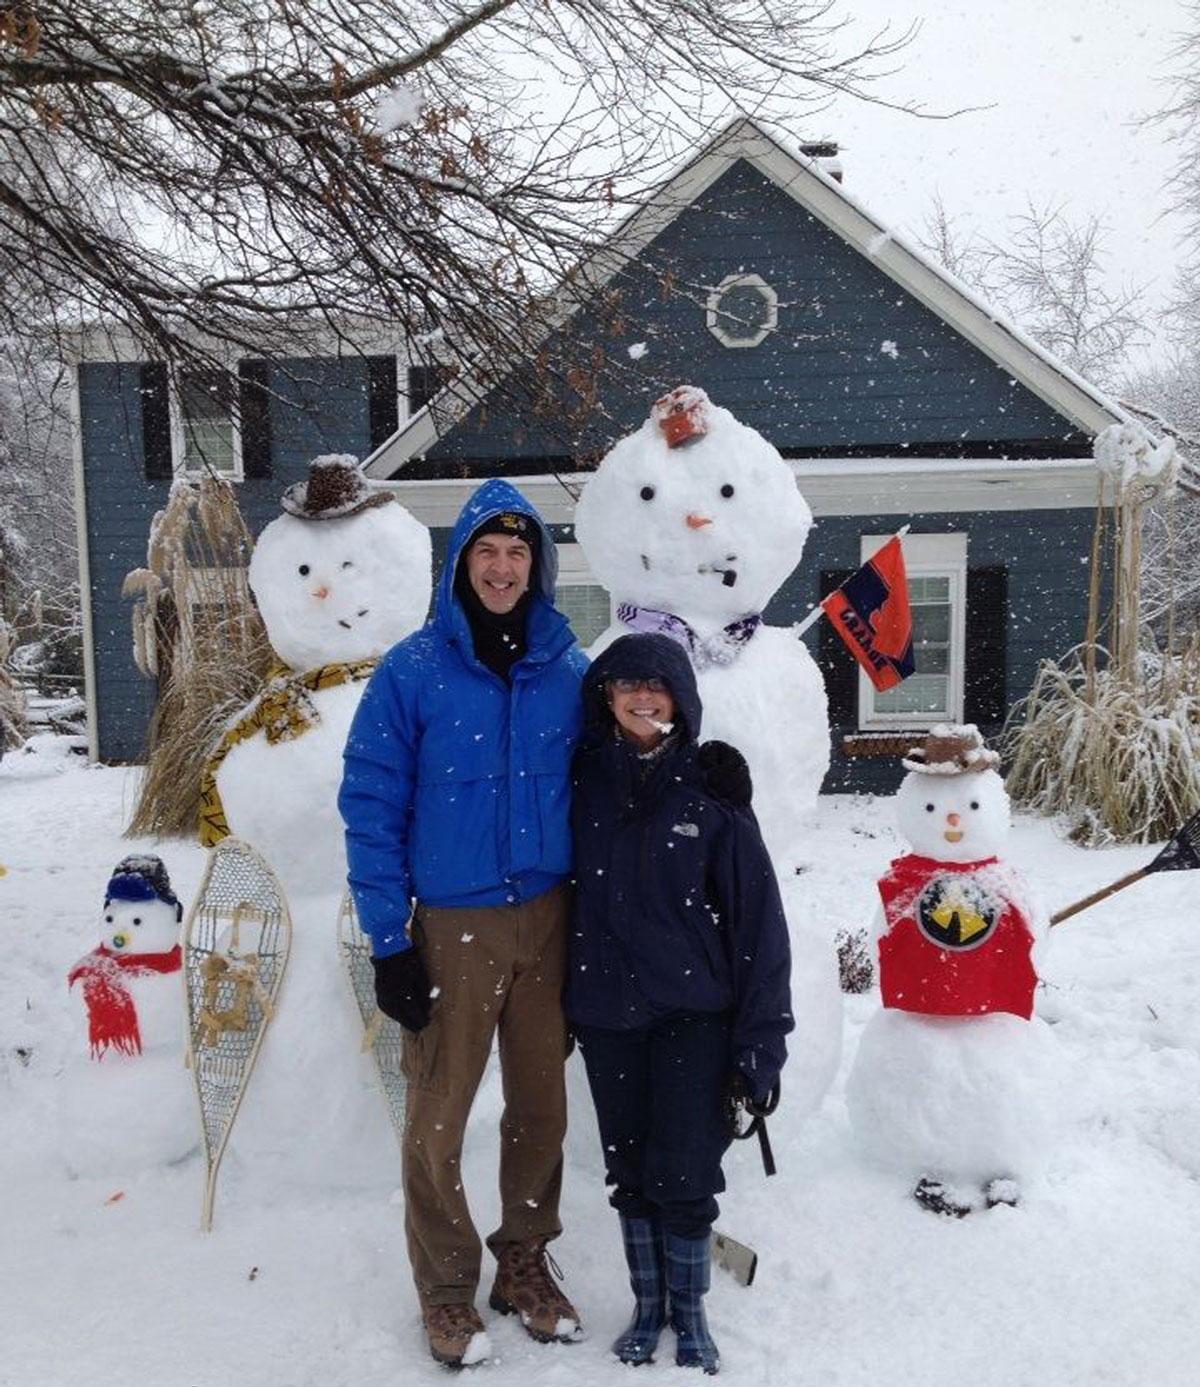 artistic photo with snowmen